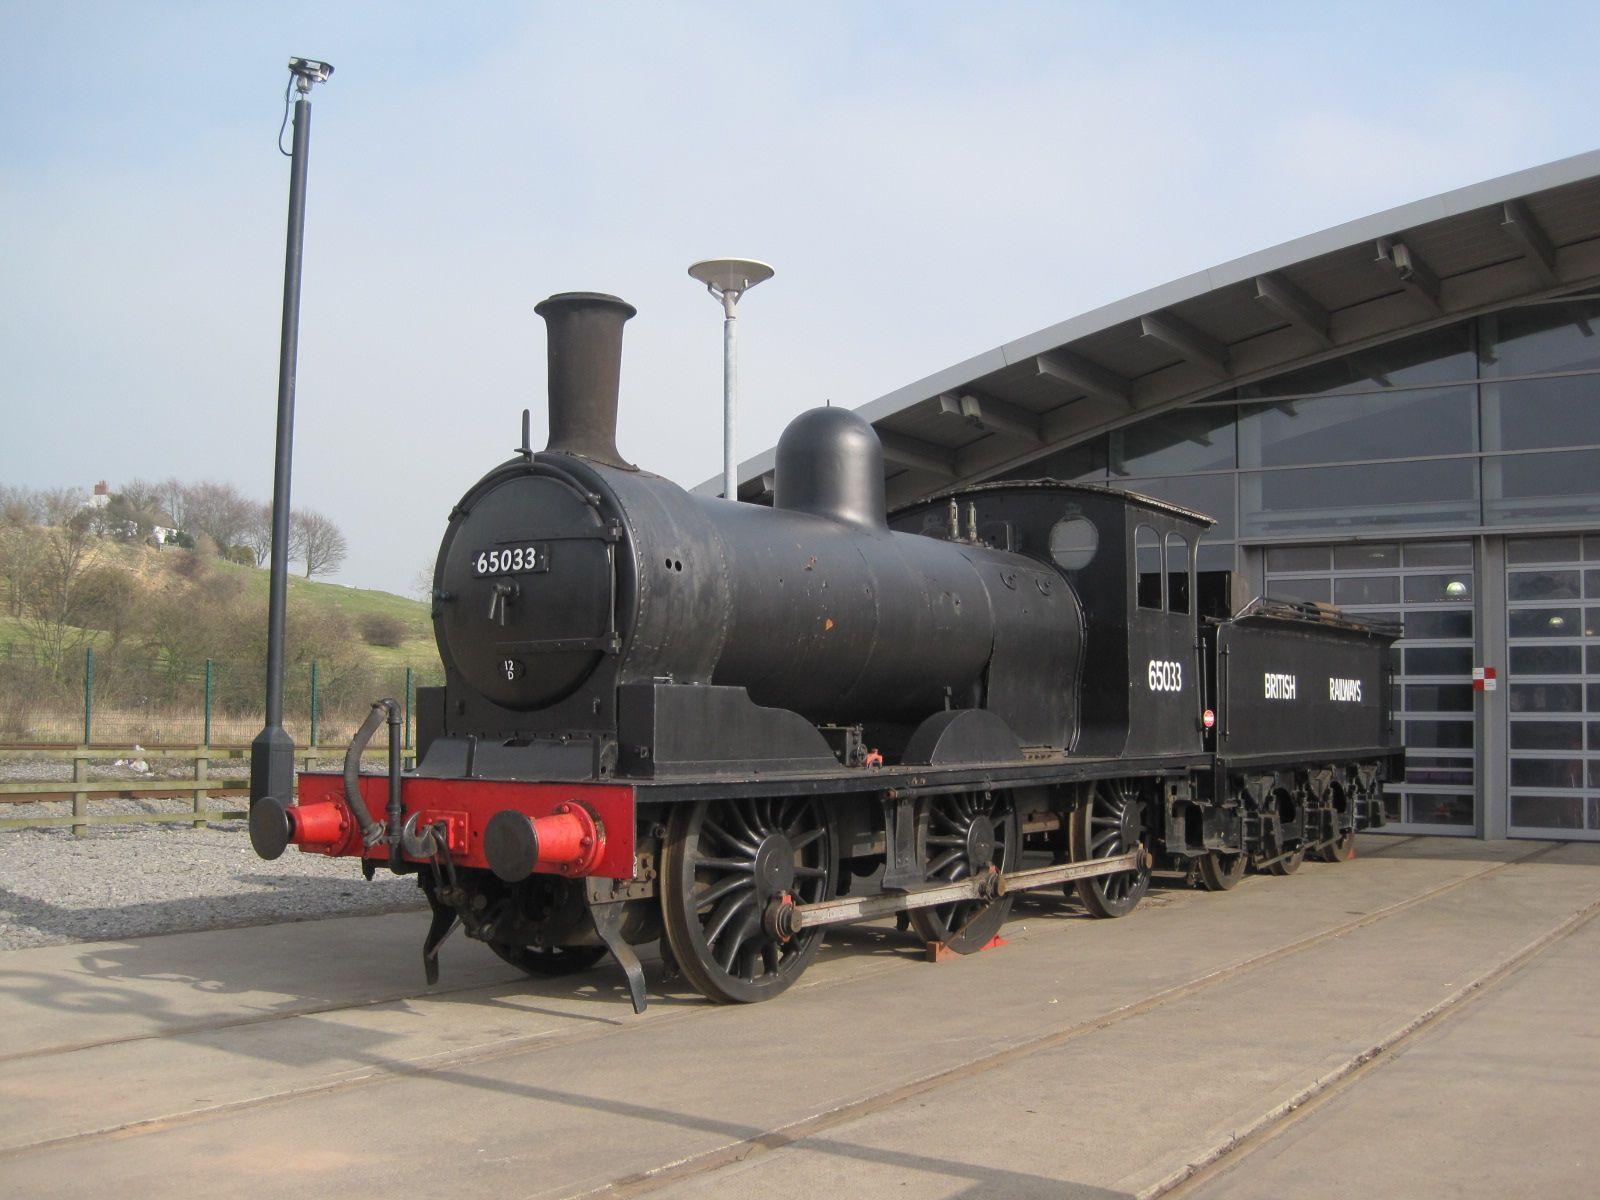 North Eastern Railway J21 65033, 'Locomotion'  Shildon 14/03